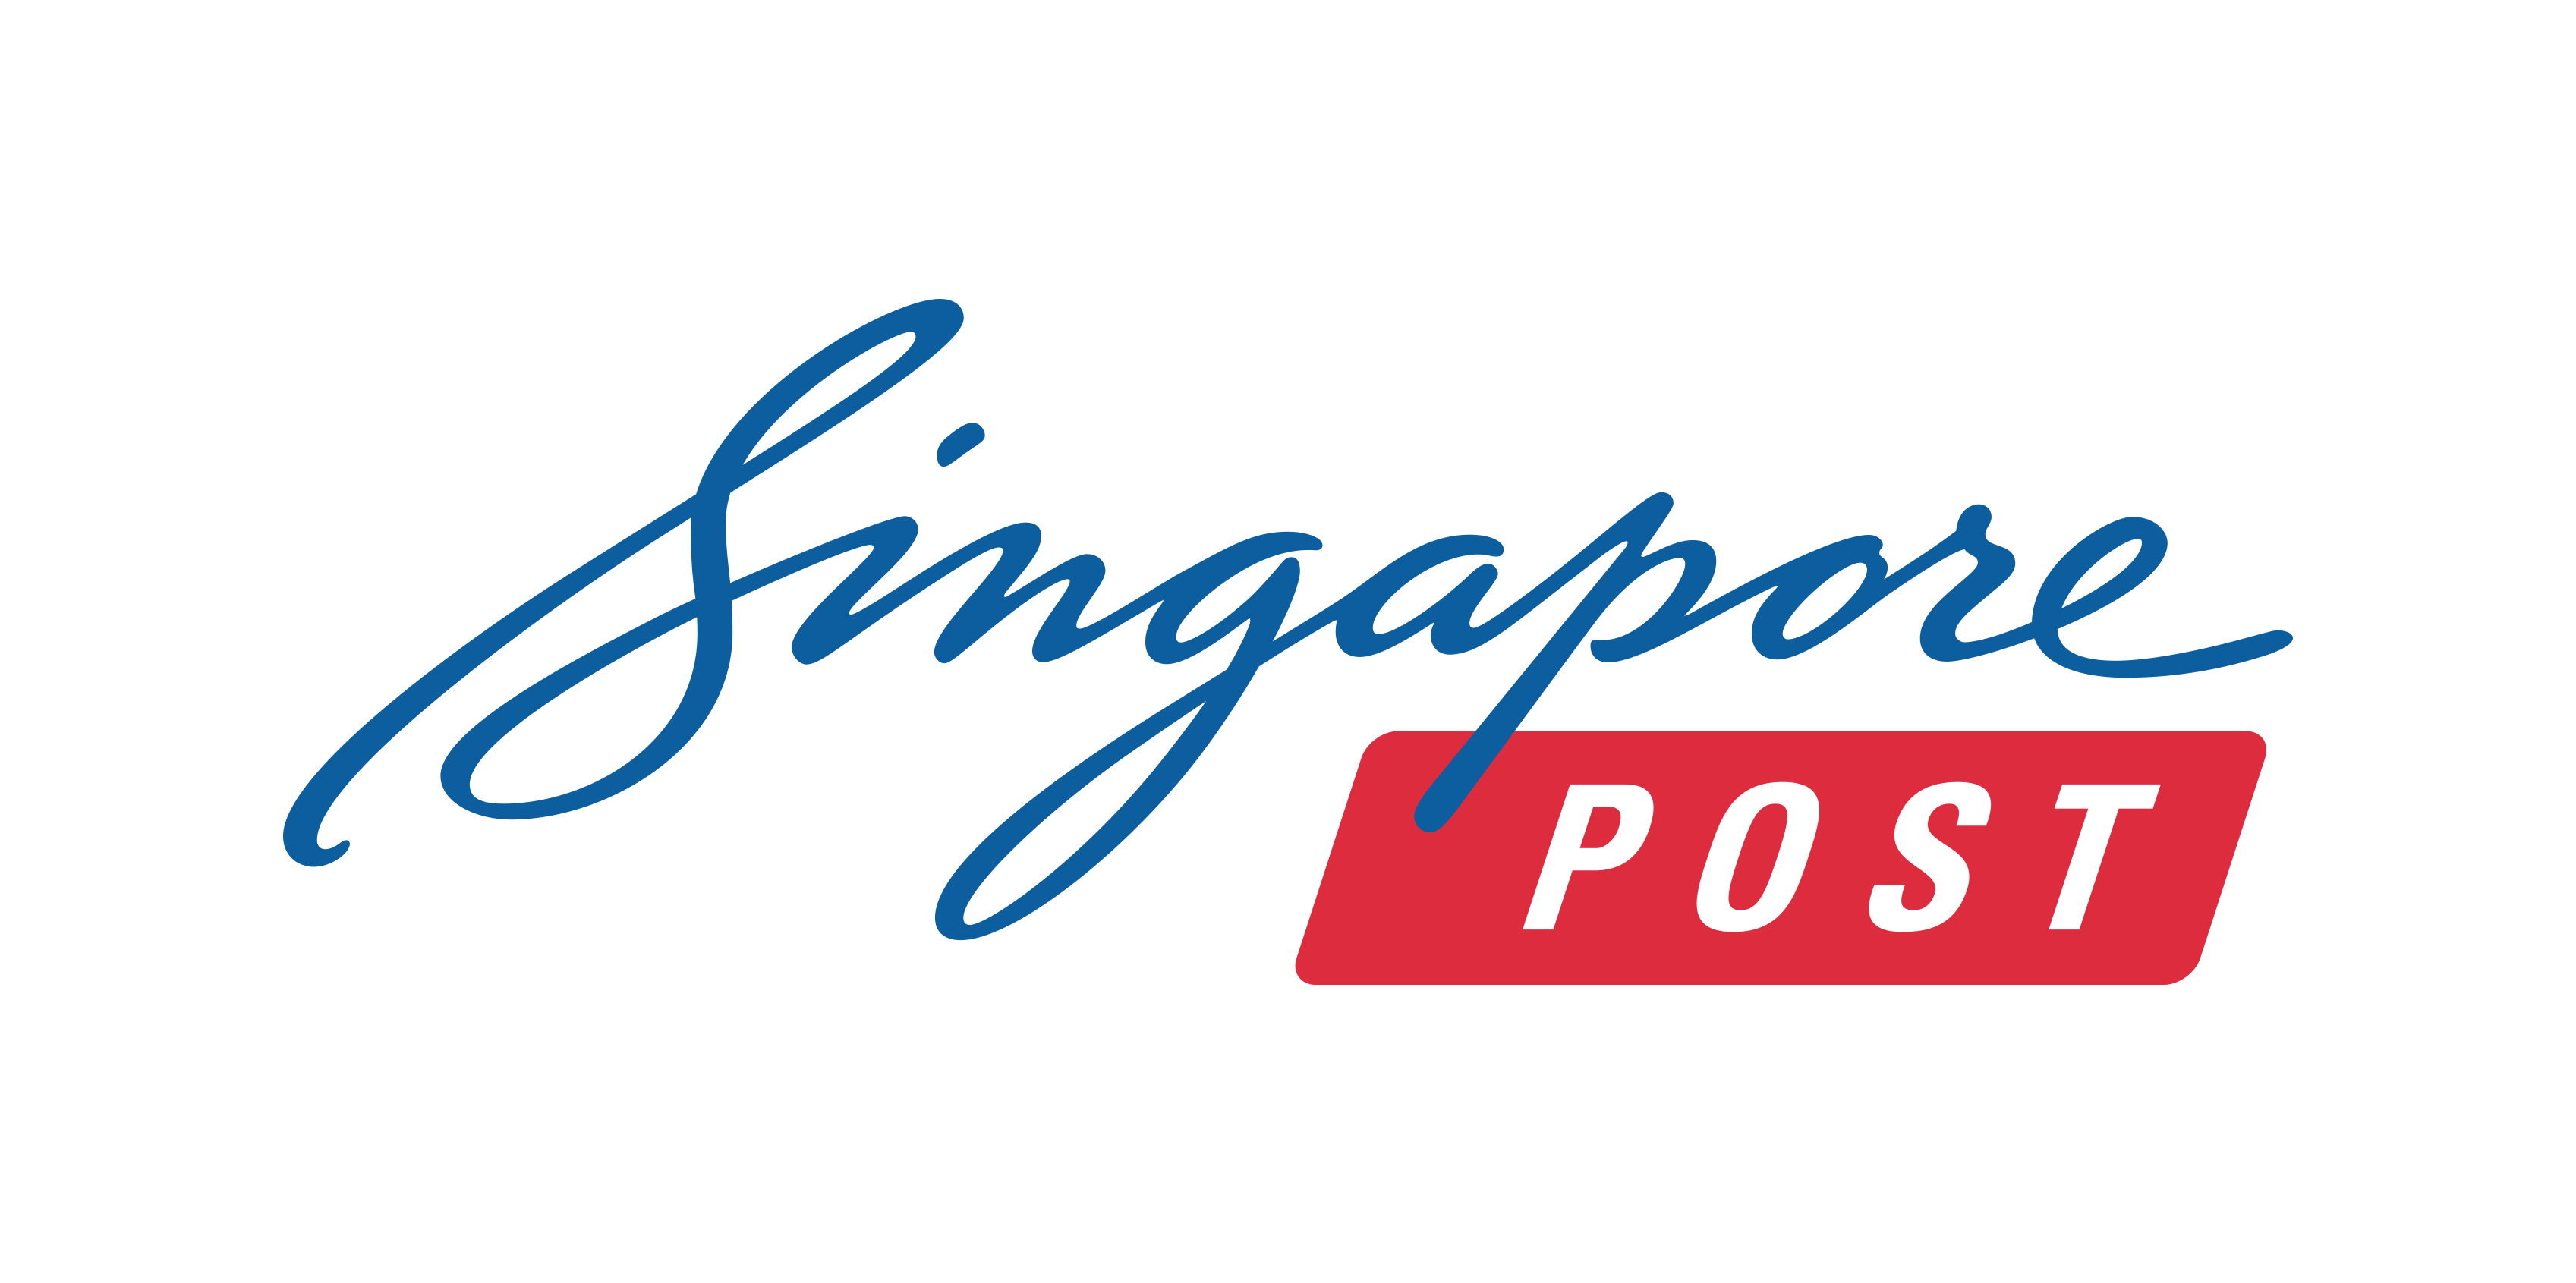 Singapore Post Ltd